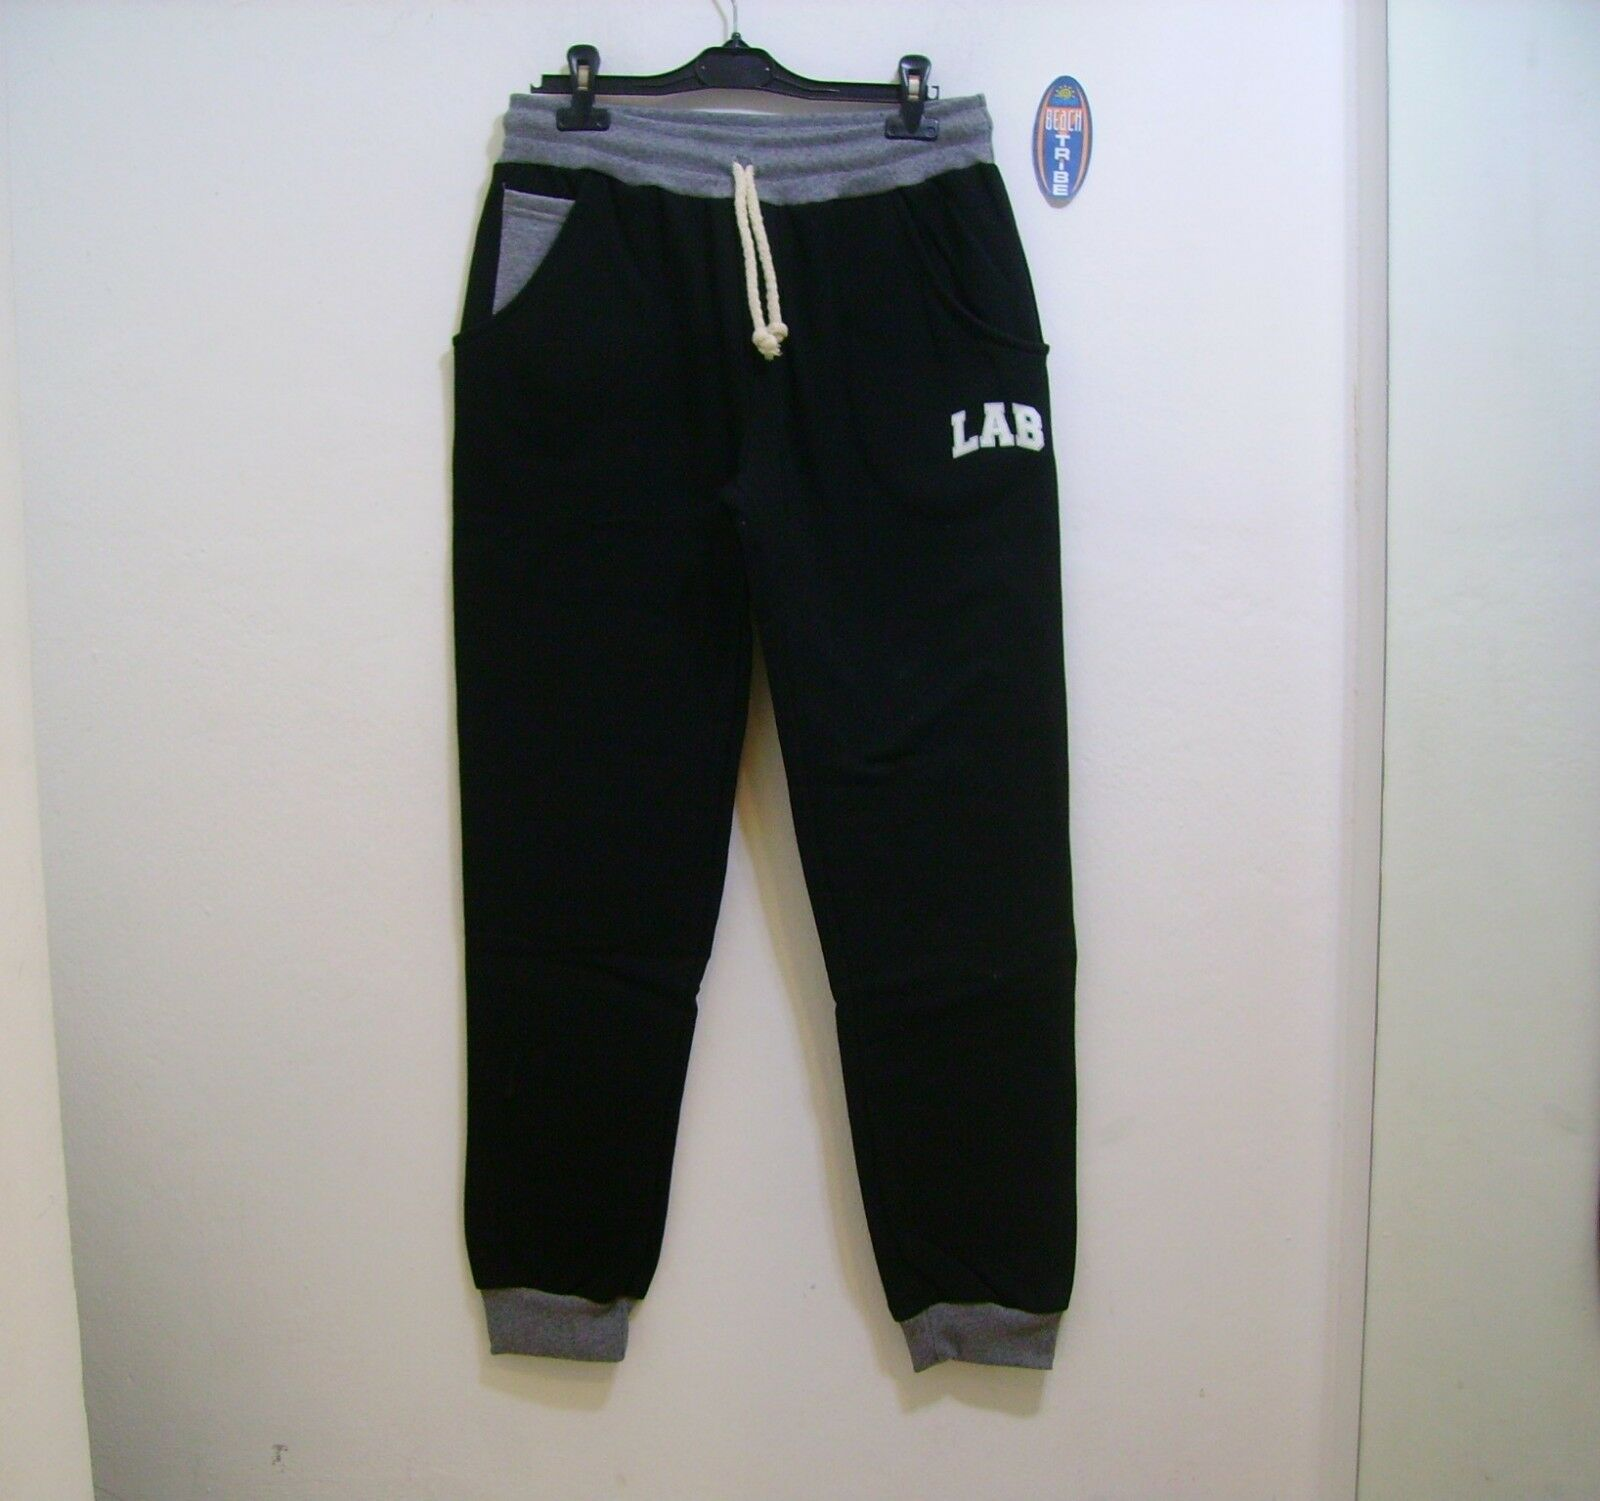 Lab84 Pantalone Tuta Lungo Felpa Invernale S8 PNTM1009 Nero Grigio Melange